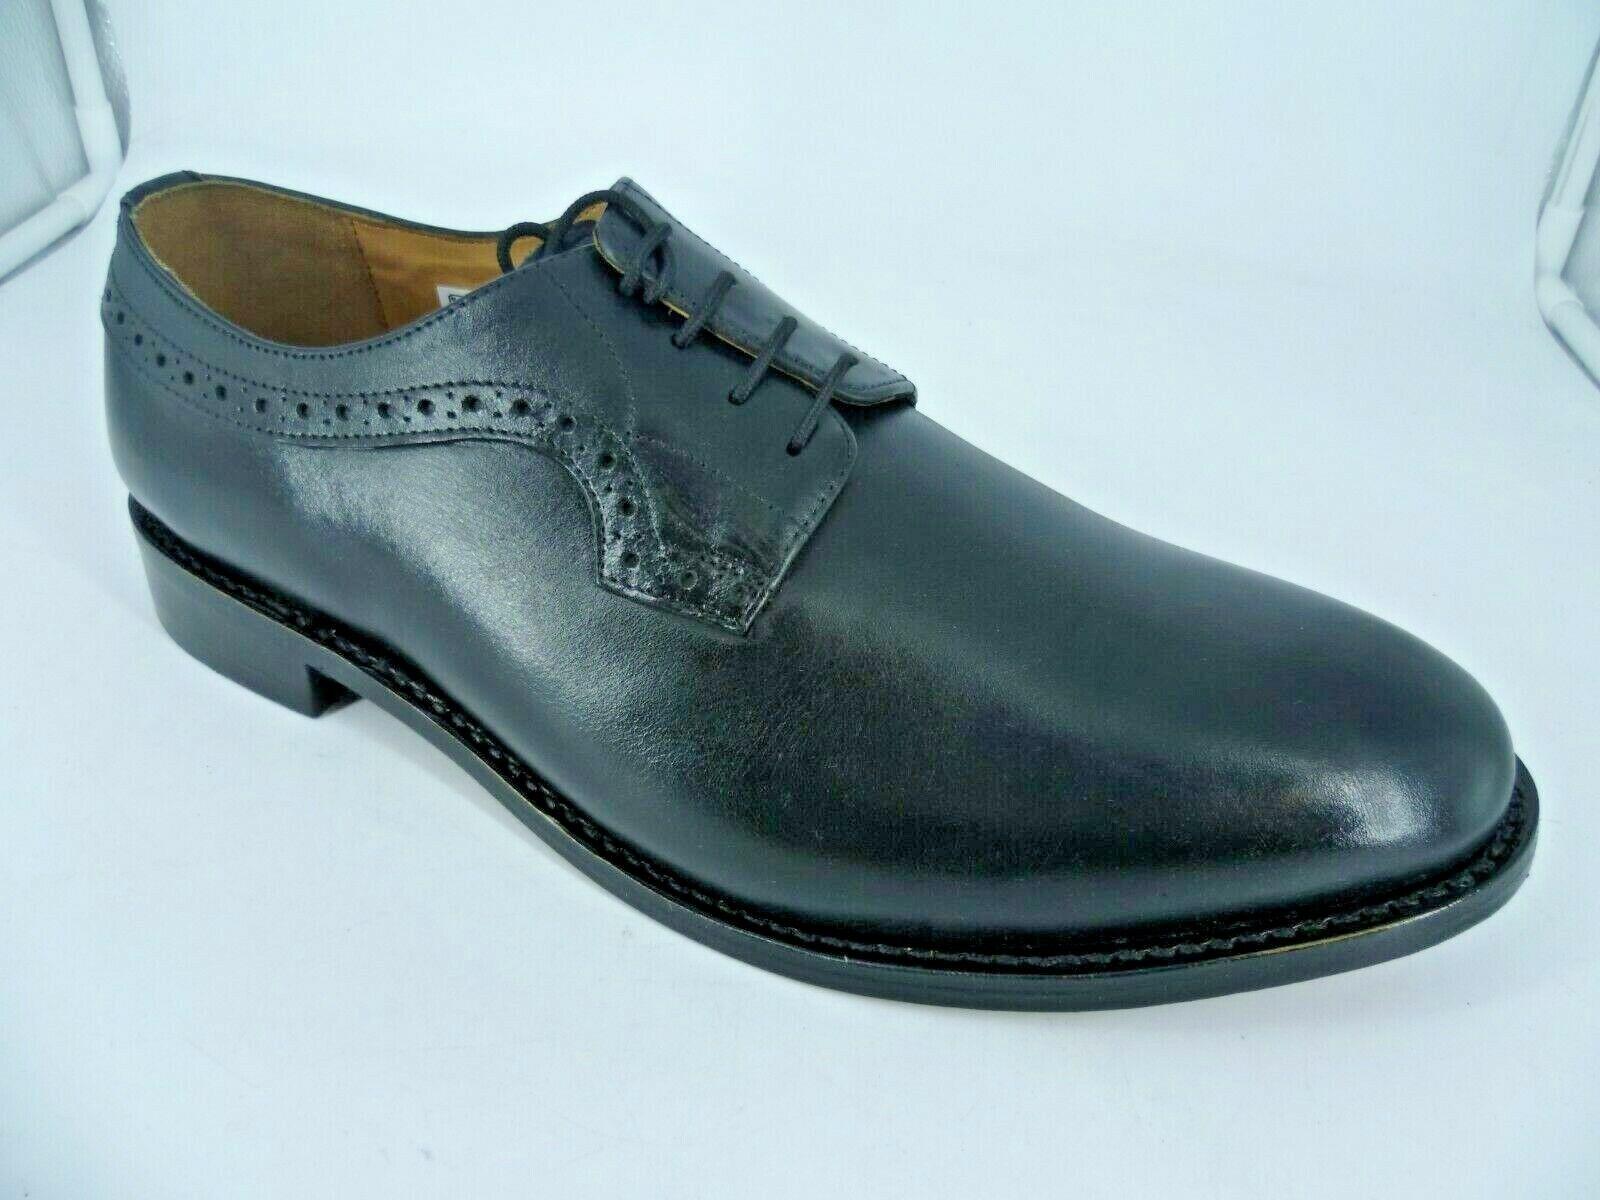 Samuel Windsor Quarter Brogue Black Lace Up shoes UK 12 EU 47 LN46 20